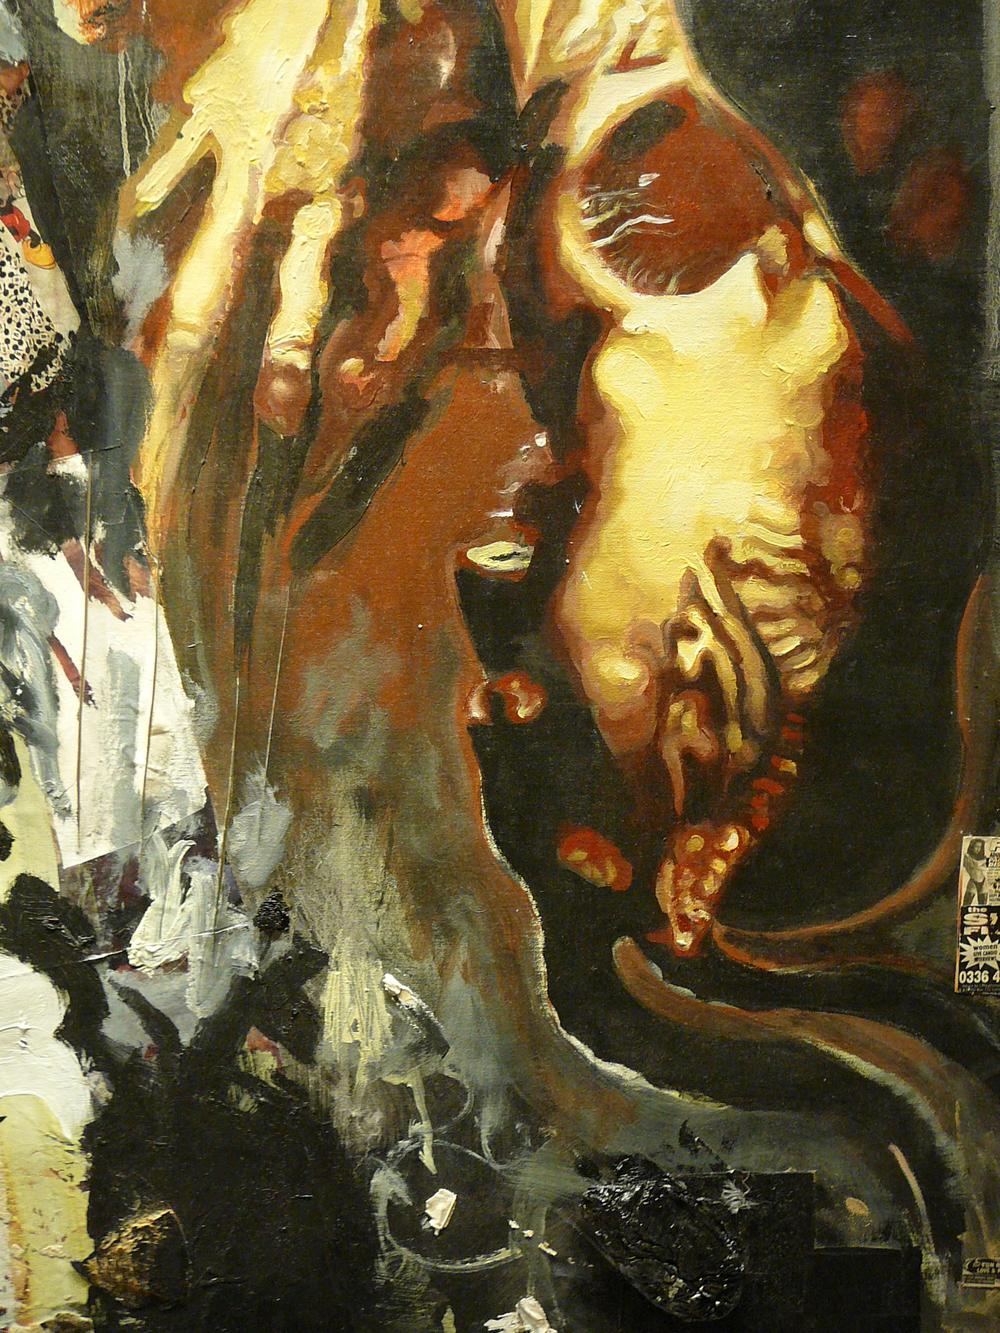 Subterraneo A Pazmino 2016 001 (107).JPG